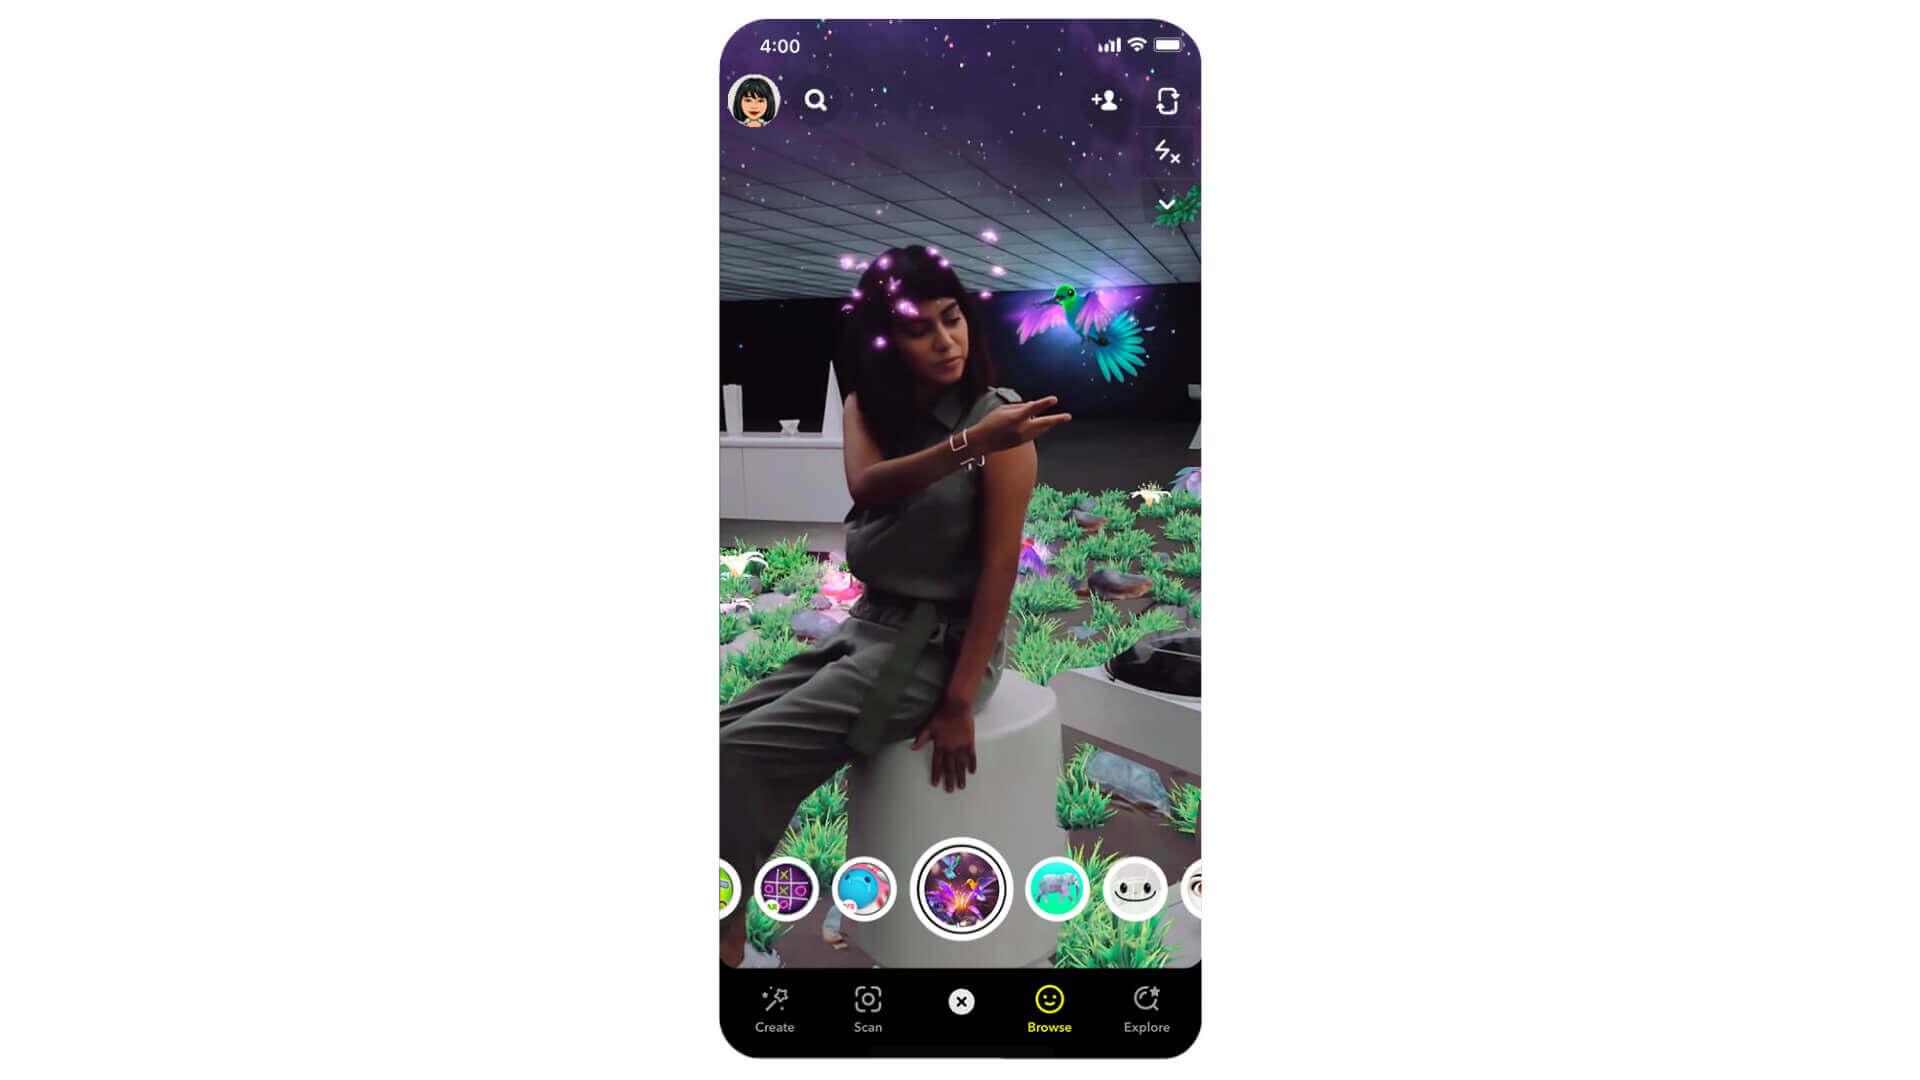 Insta :  Objectifs Snapchat Lidar pour iPhone 12 Pro